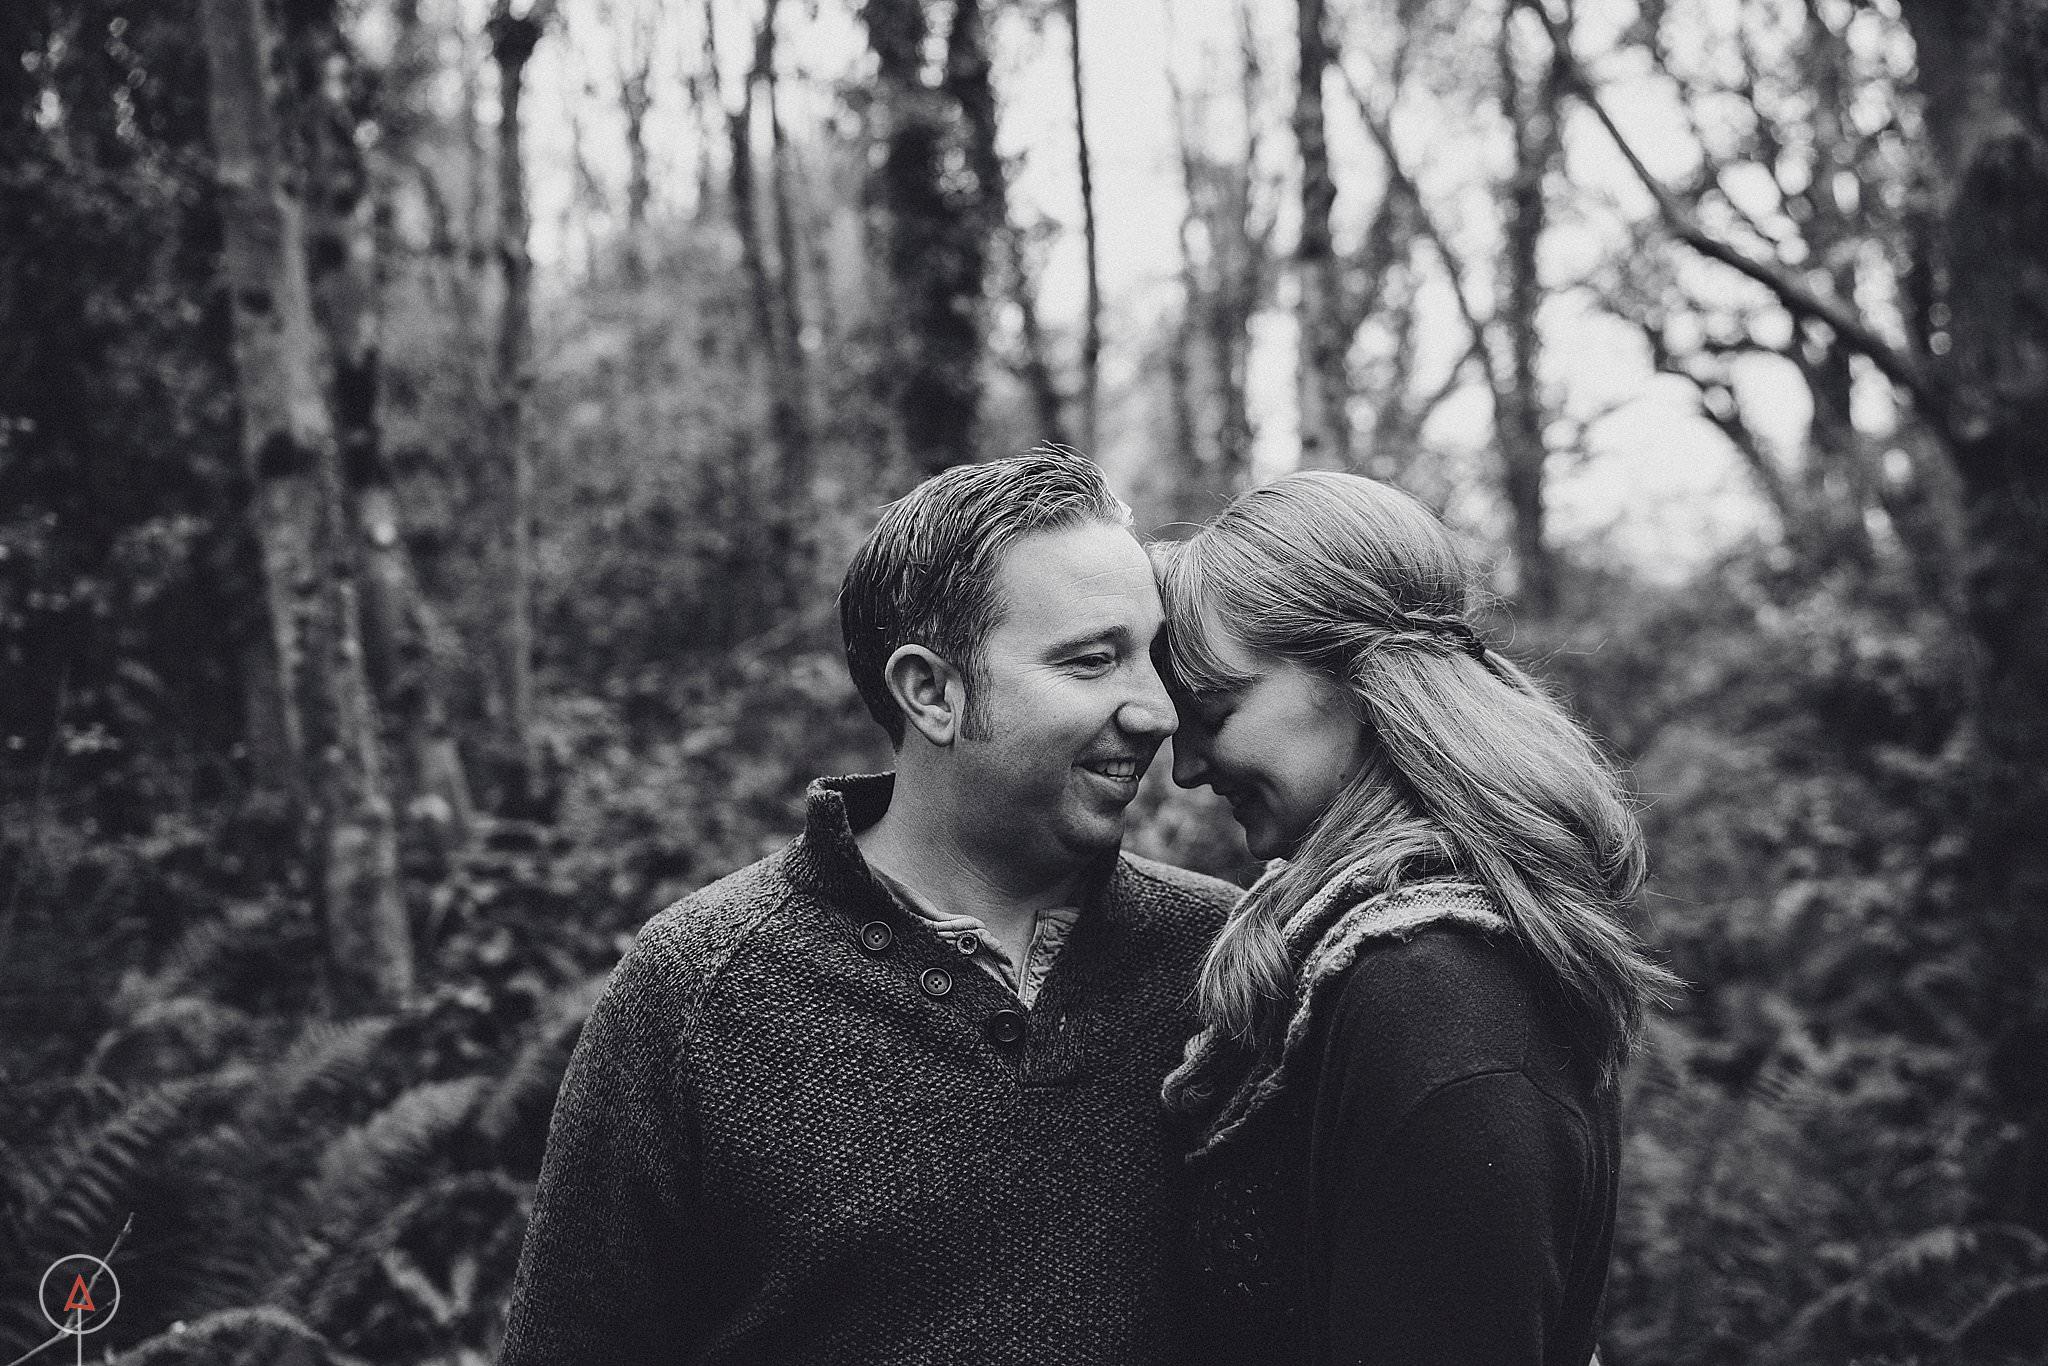 South-Wales-Pre-Wedding-Photography-Aga-Tomaszek-00011